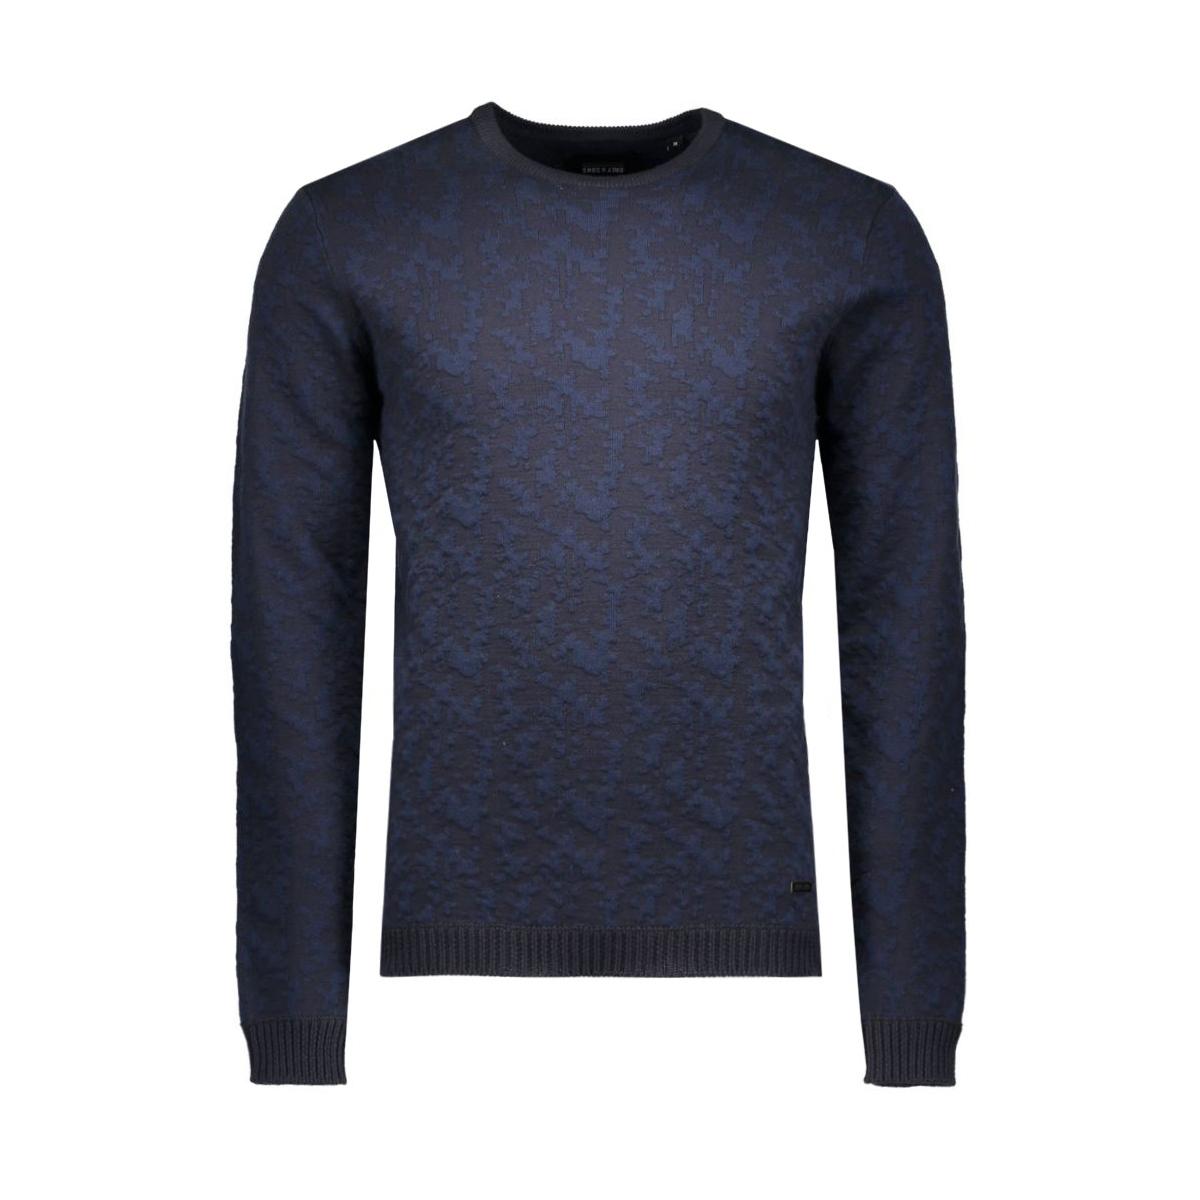 onsdakota crew neck knit 22004104 only & sons sweater dark navy